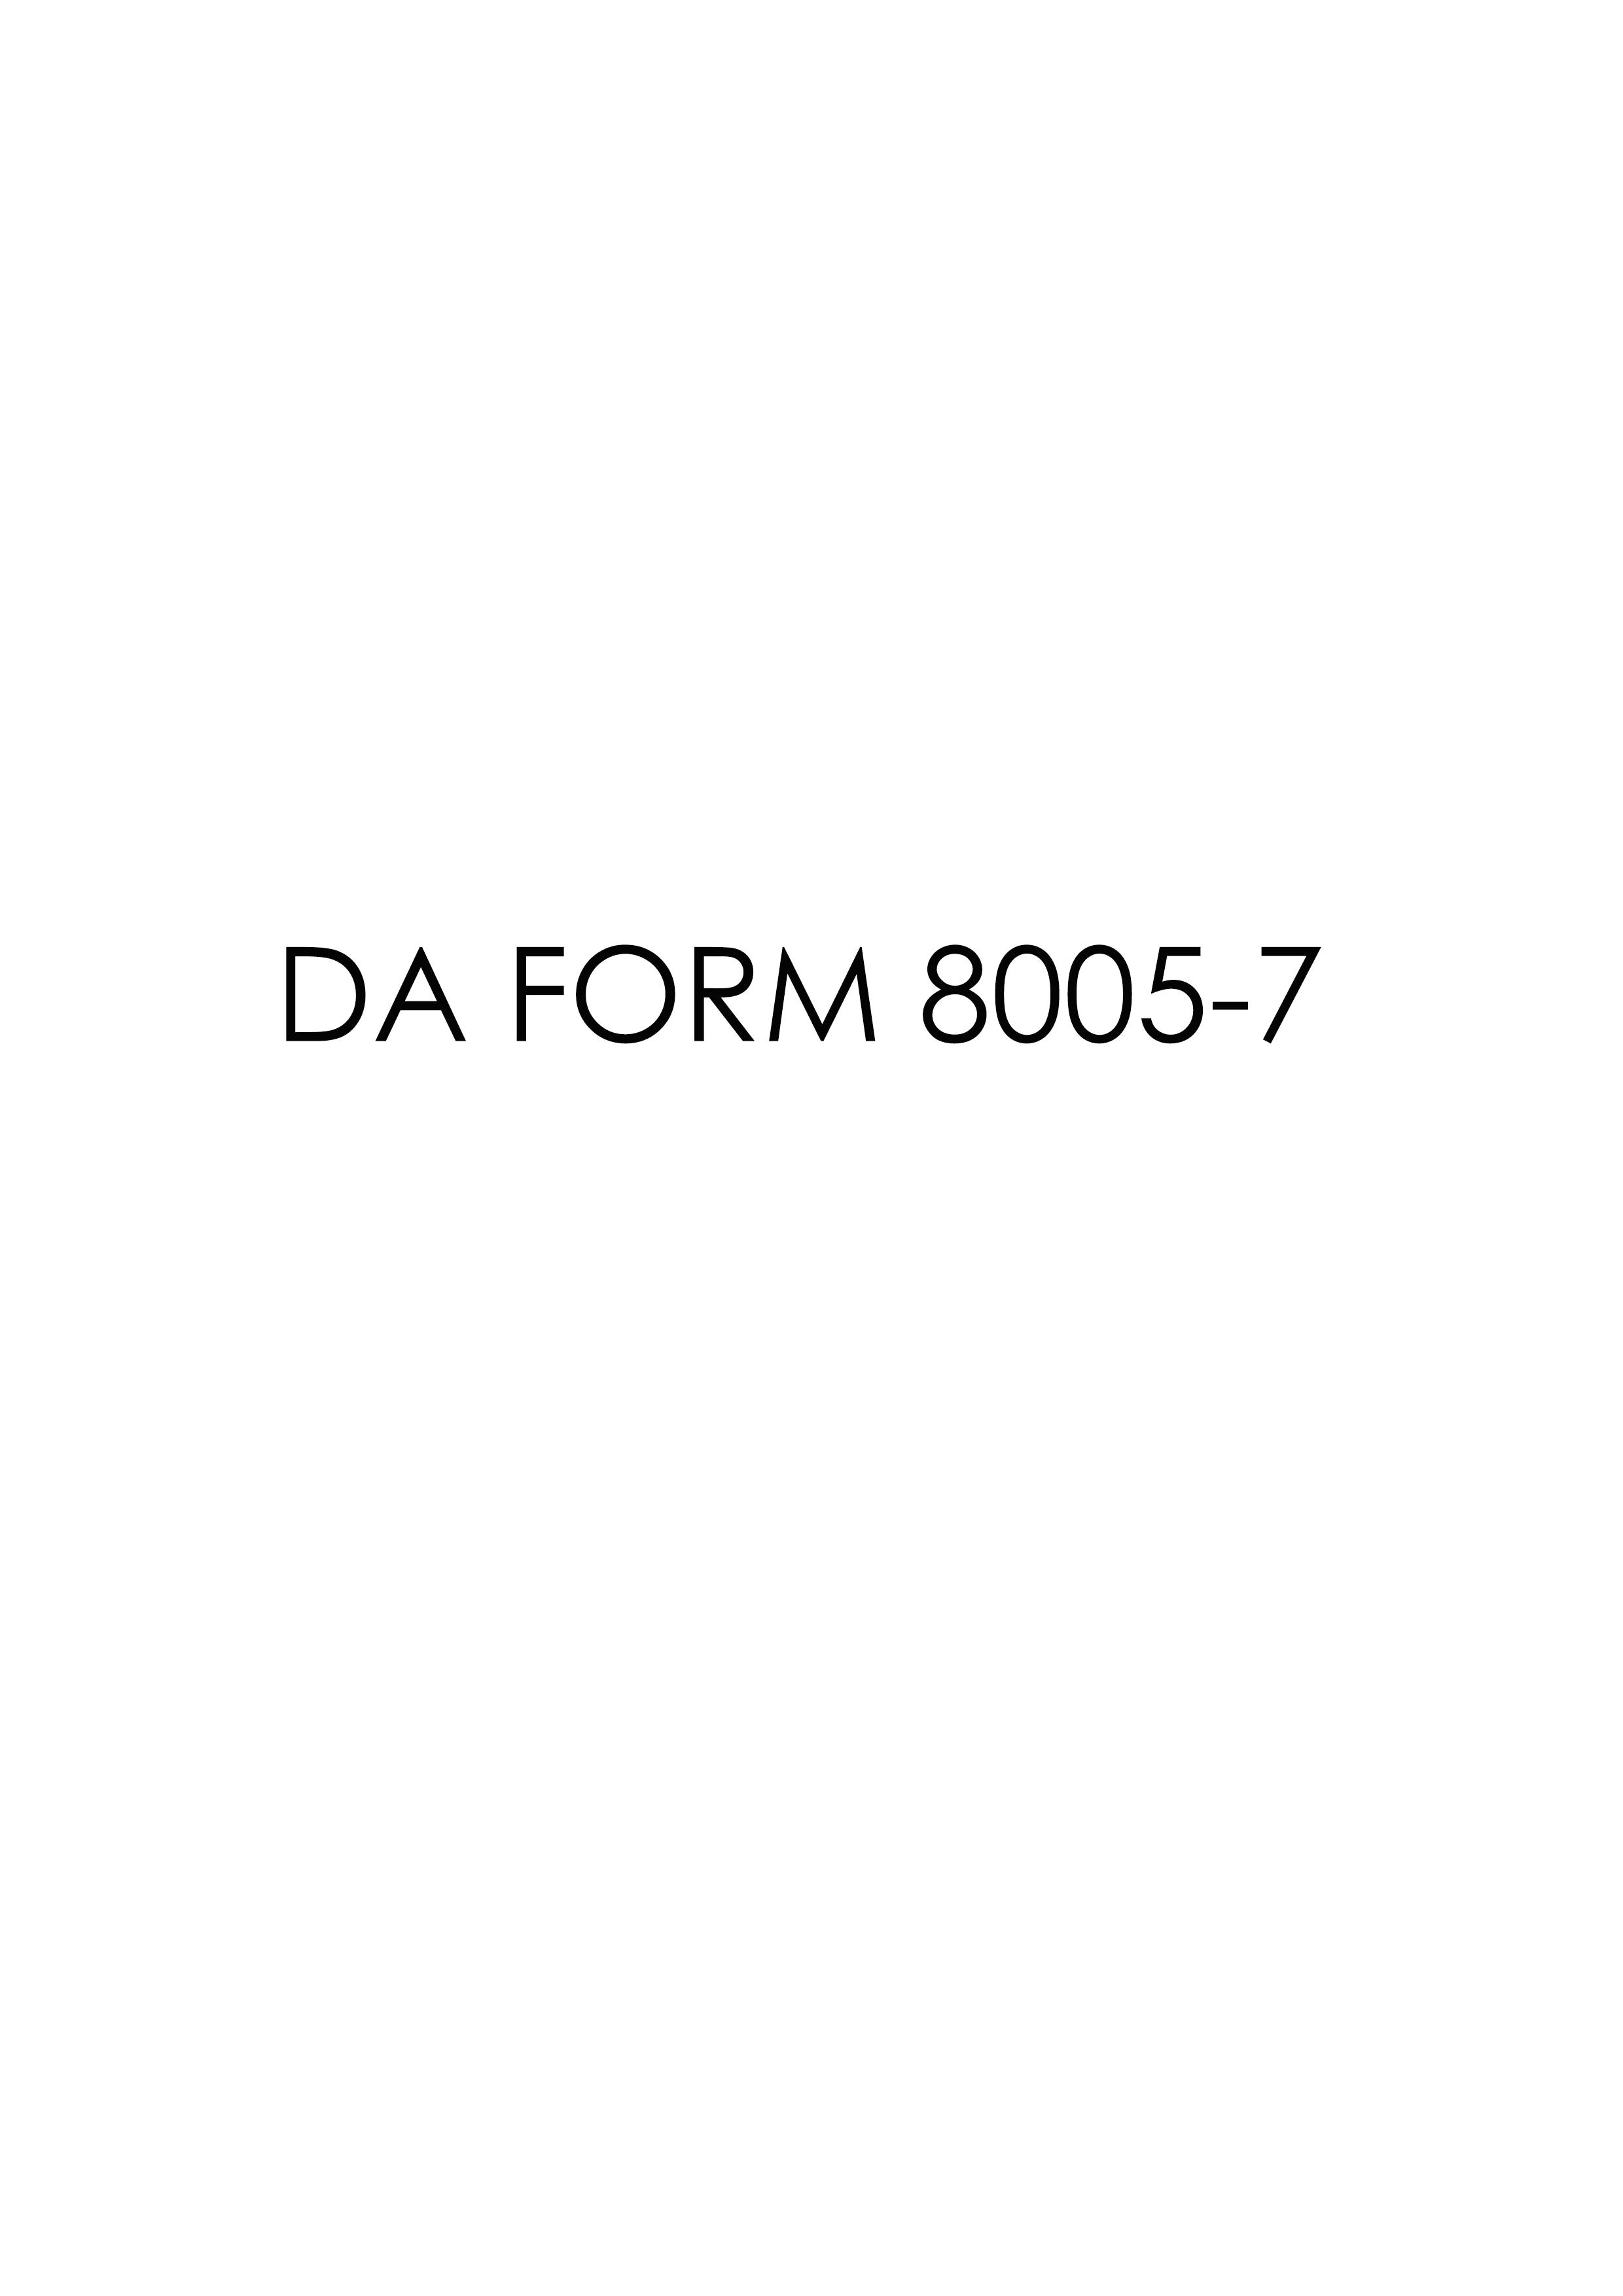 Download da Form 8005-7 Free